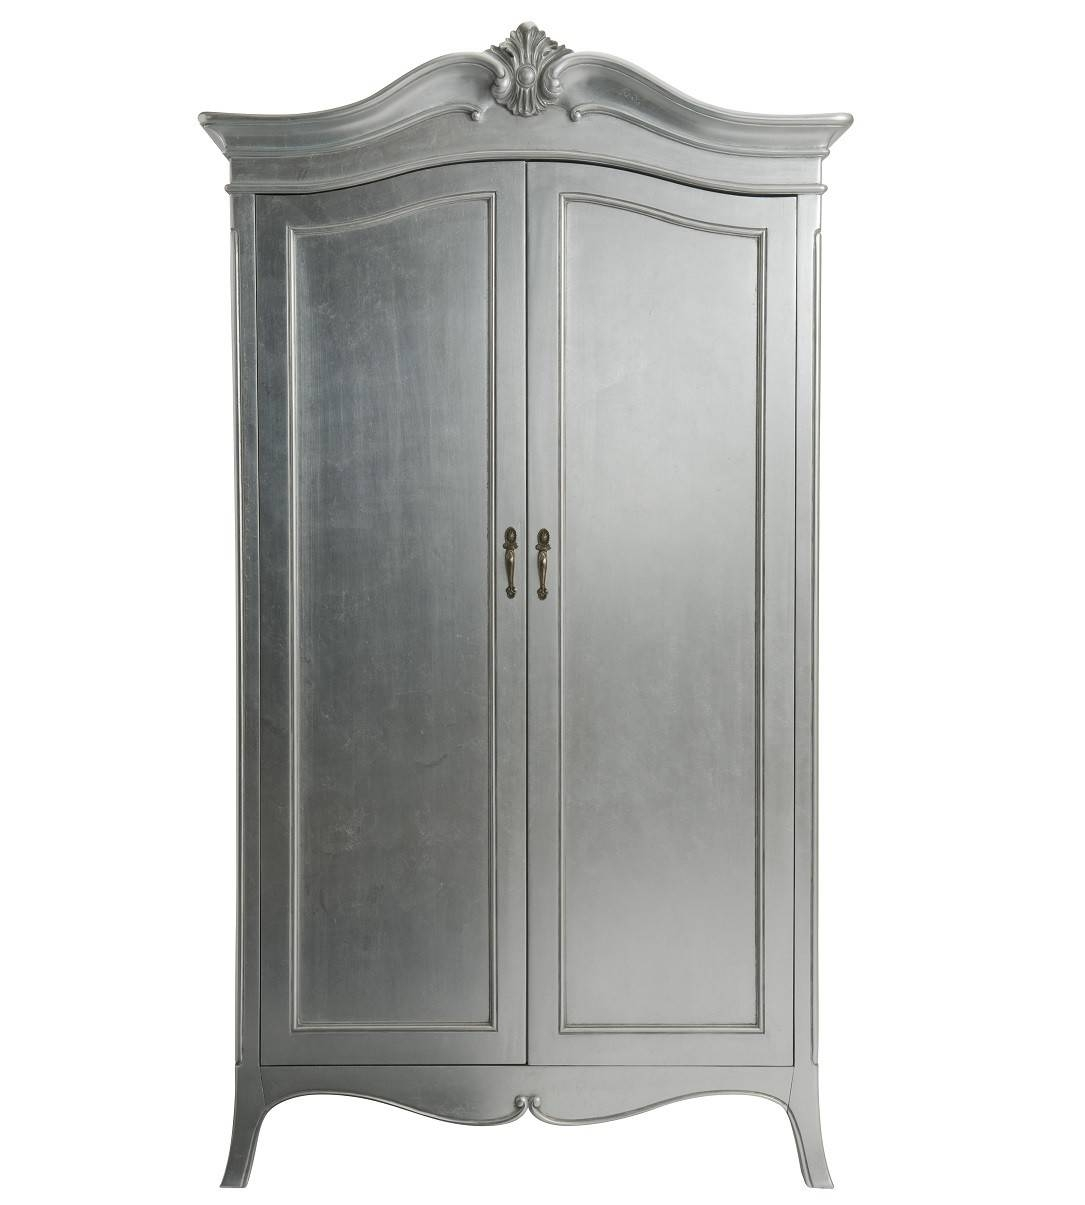 Louis French Silver Leaf 2 Door Double Wardrobe | Oak Furniture Uk With Regard To Sophia Wardrobes (View 8 of 15)